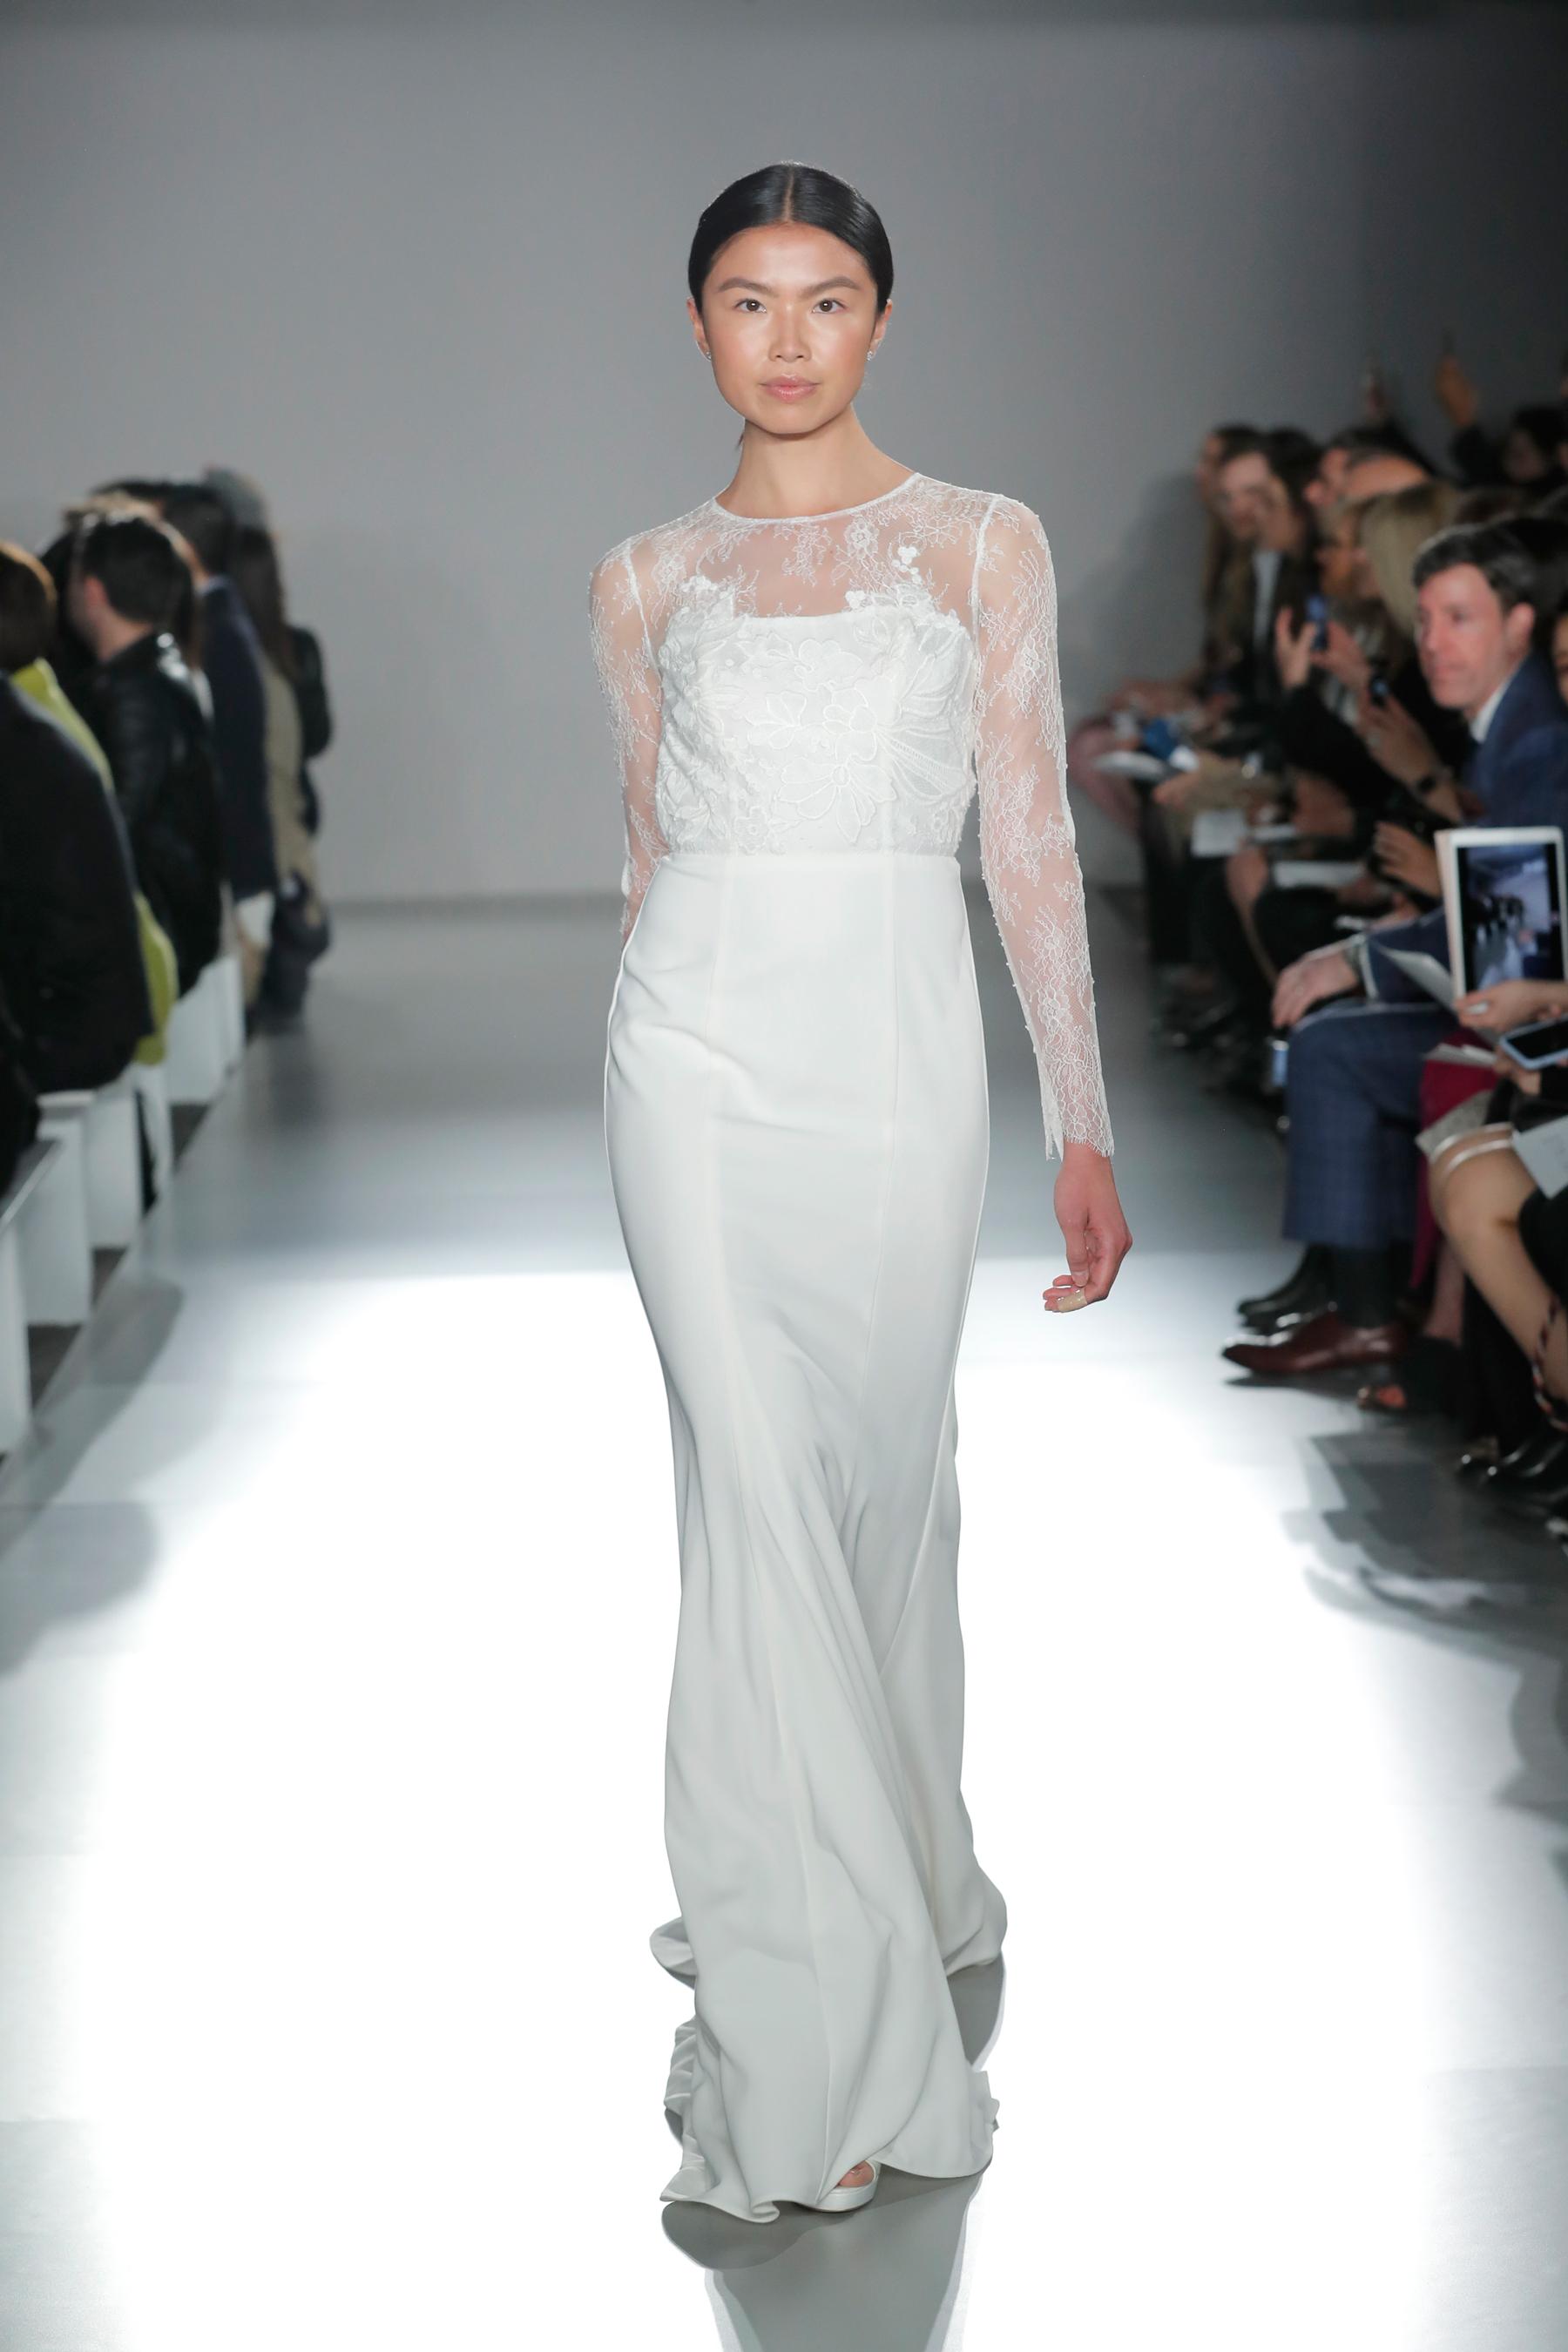 nouvelle amsale lace long sleeve sheath wedding dress spring 2020